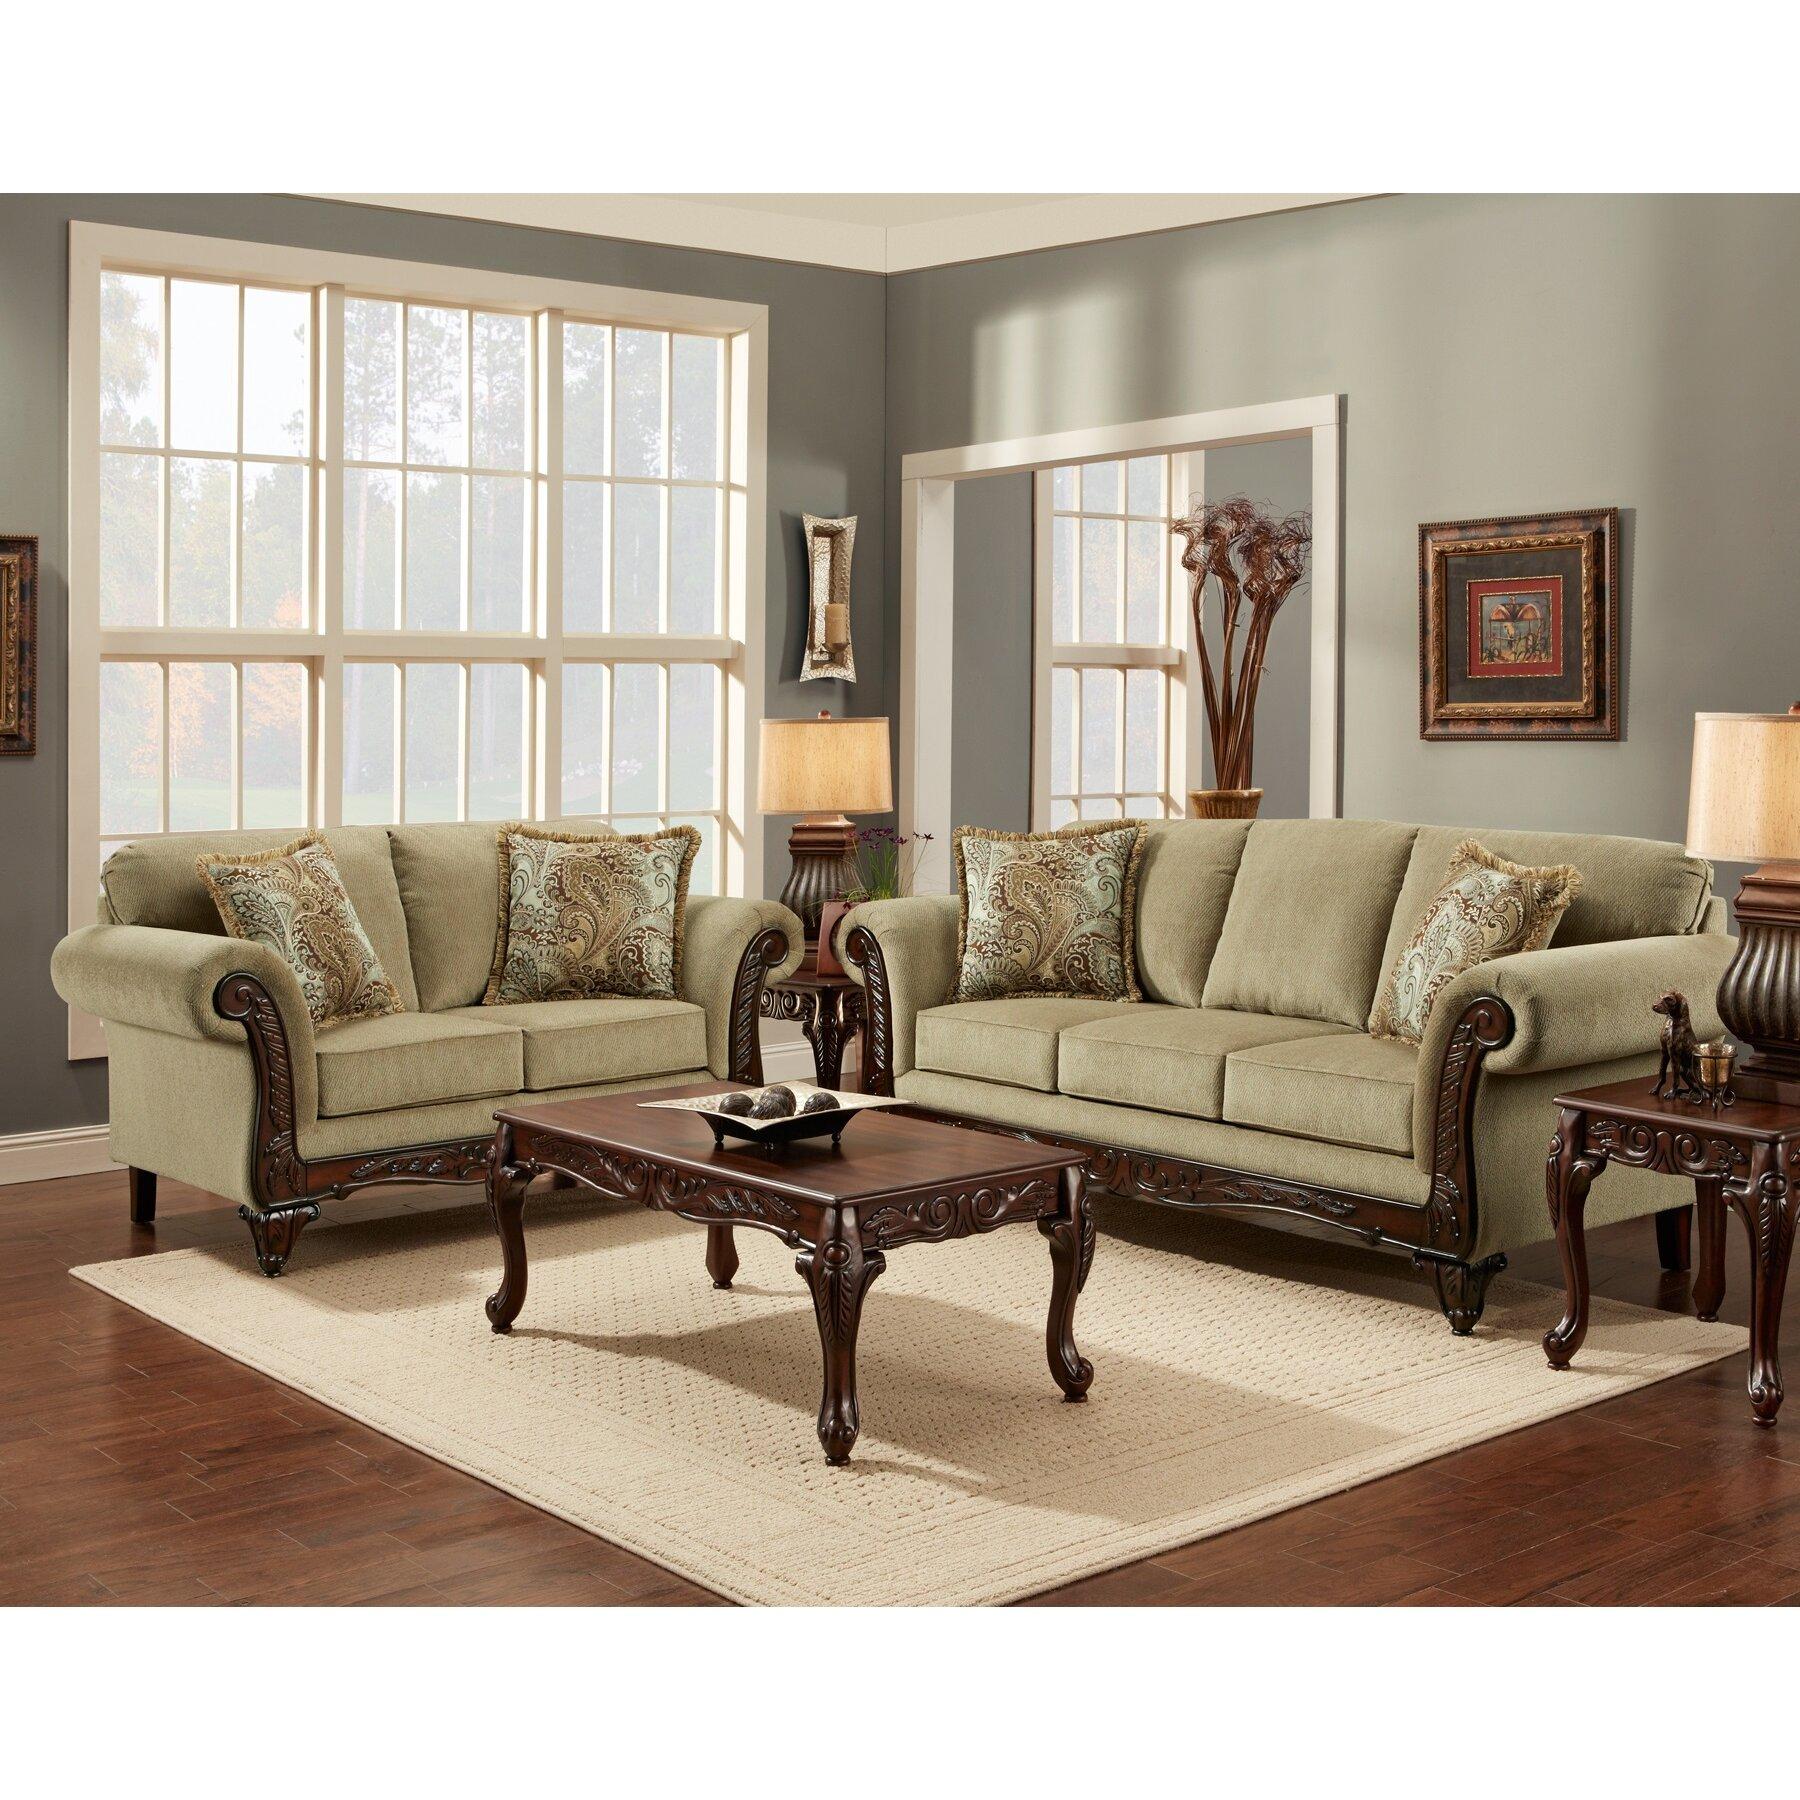 astoria grand liddington living room collection reviews wayfair. Black Bedroom Furniture Sets. Home Design Ideas